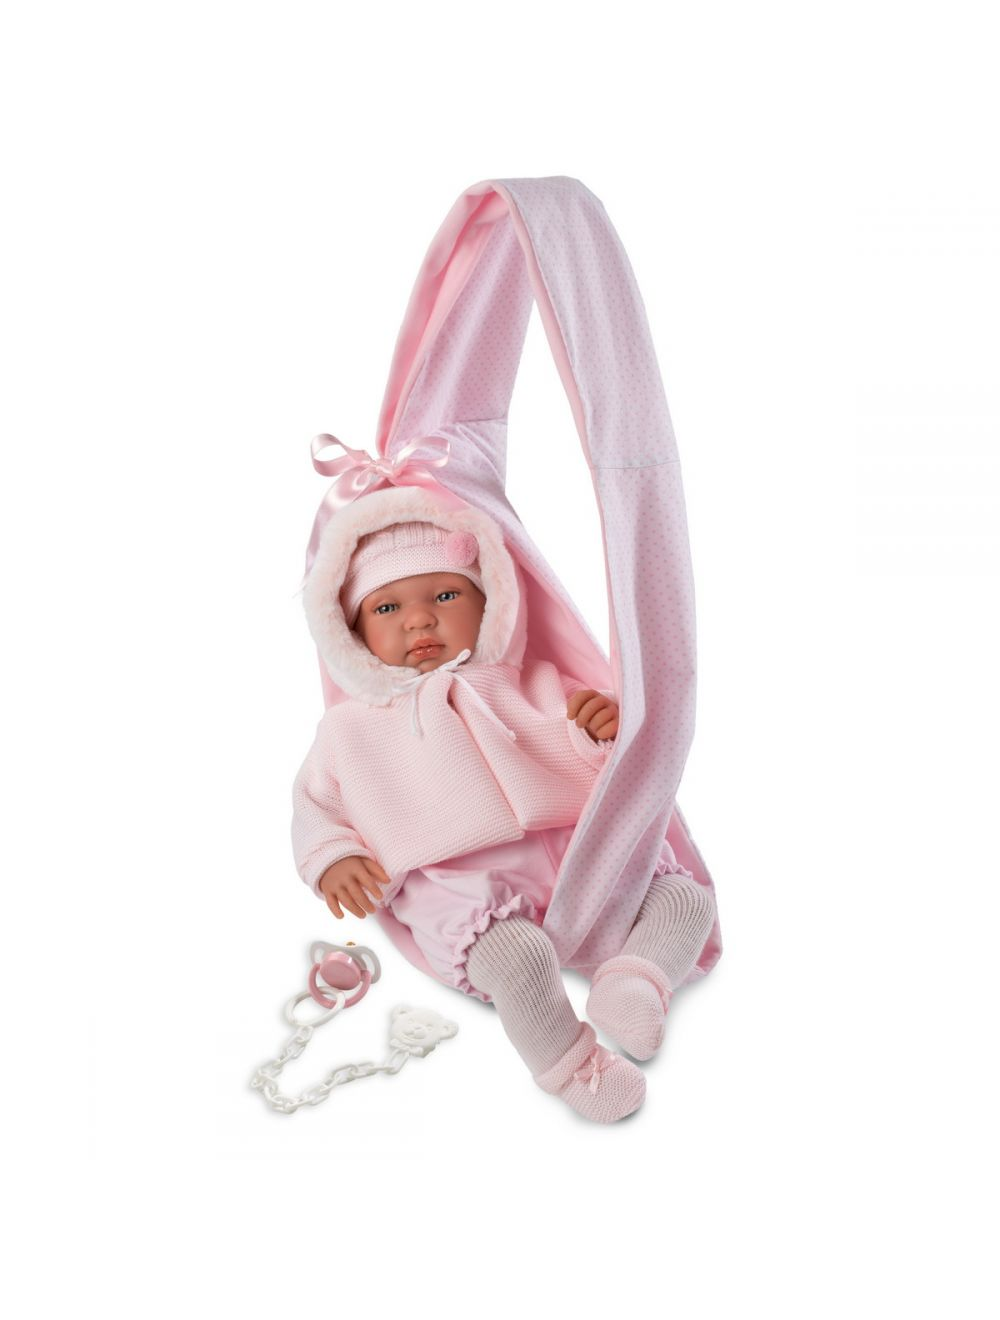 Llorens 84422 Lalka płacząca bobas Beba 44 cm różowa chusta